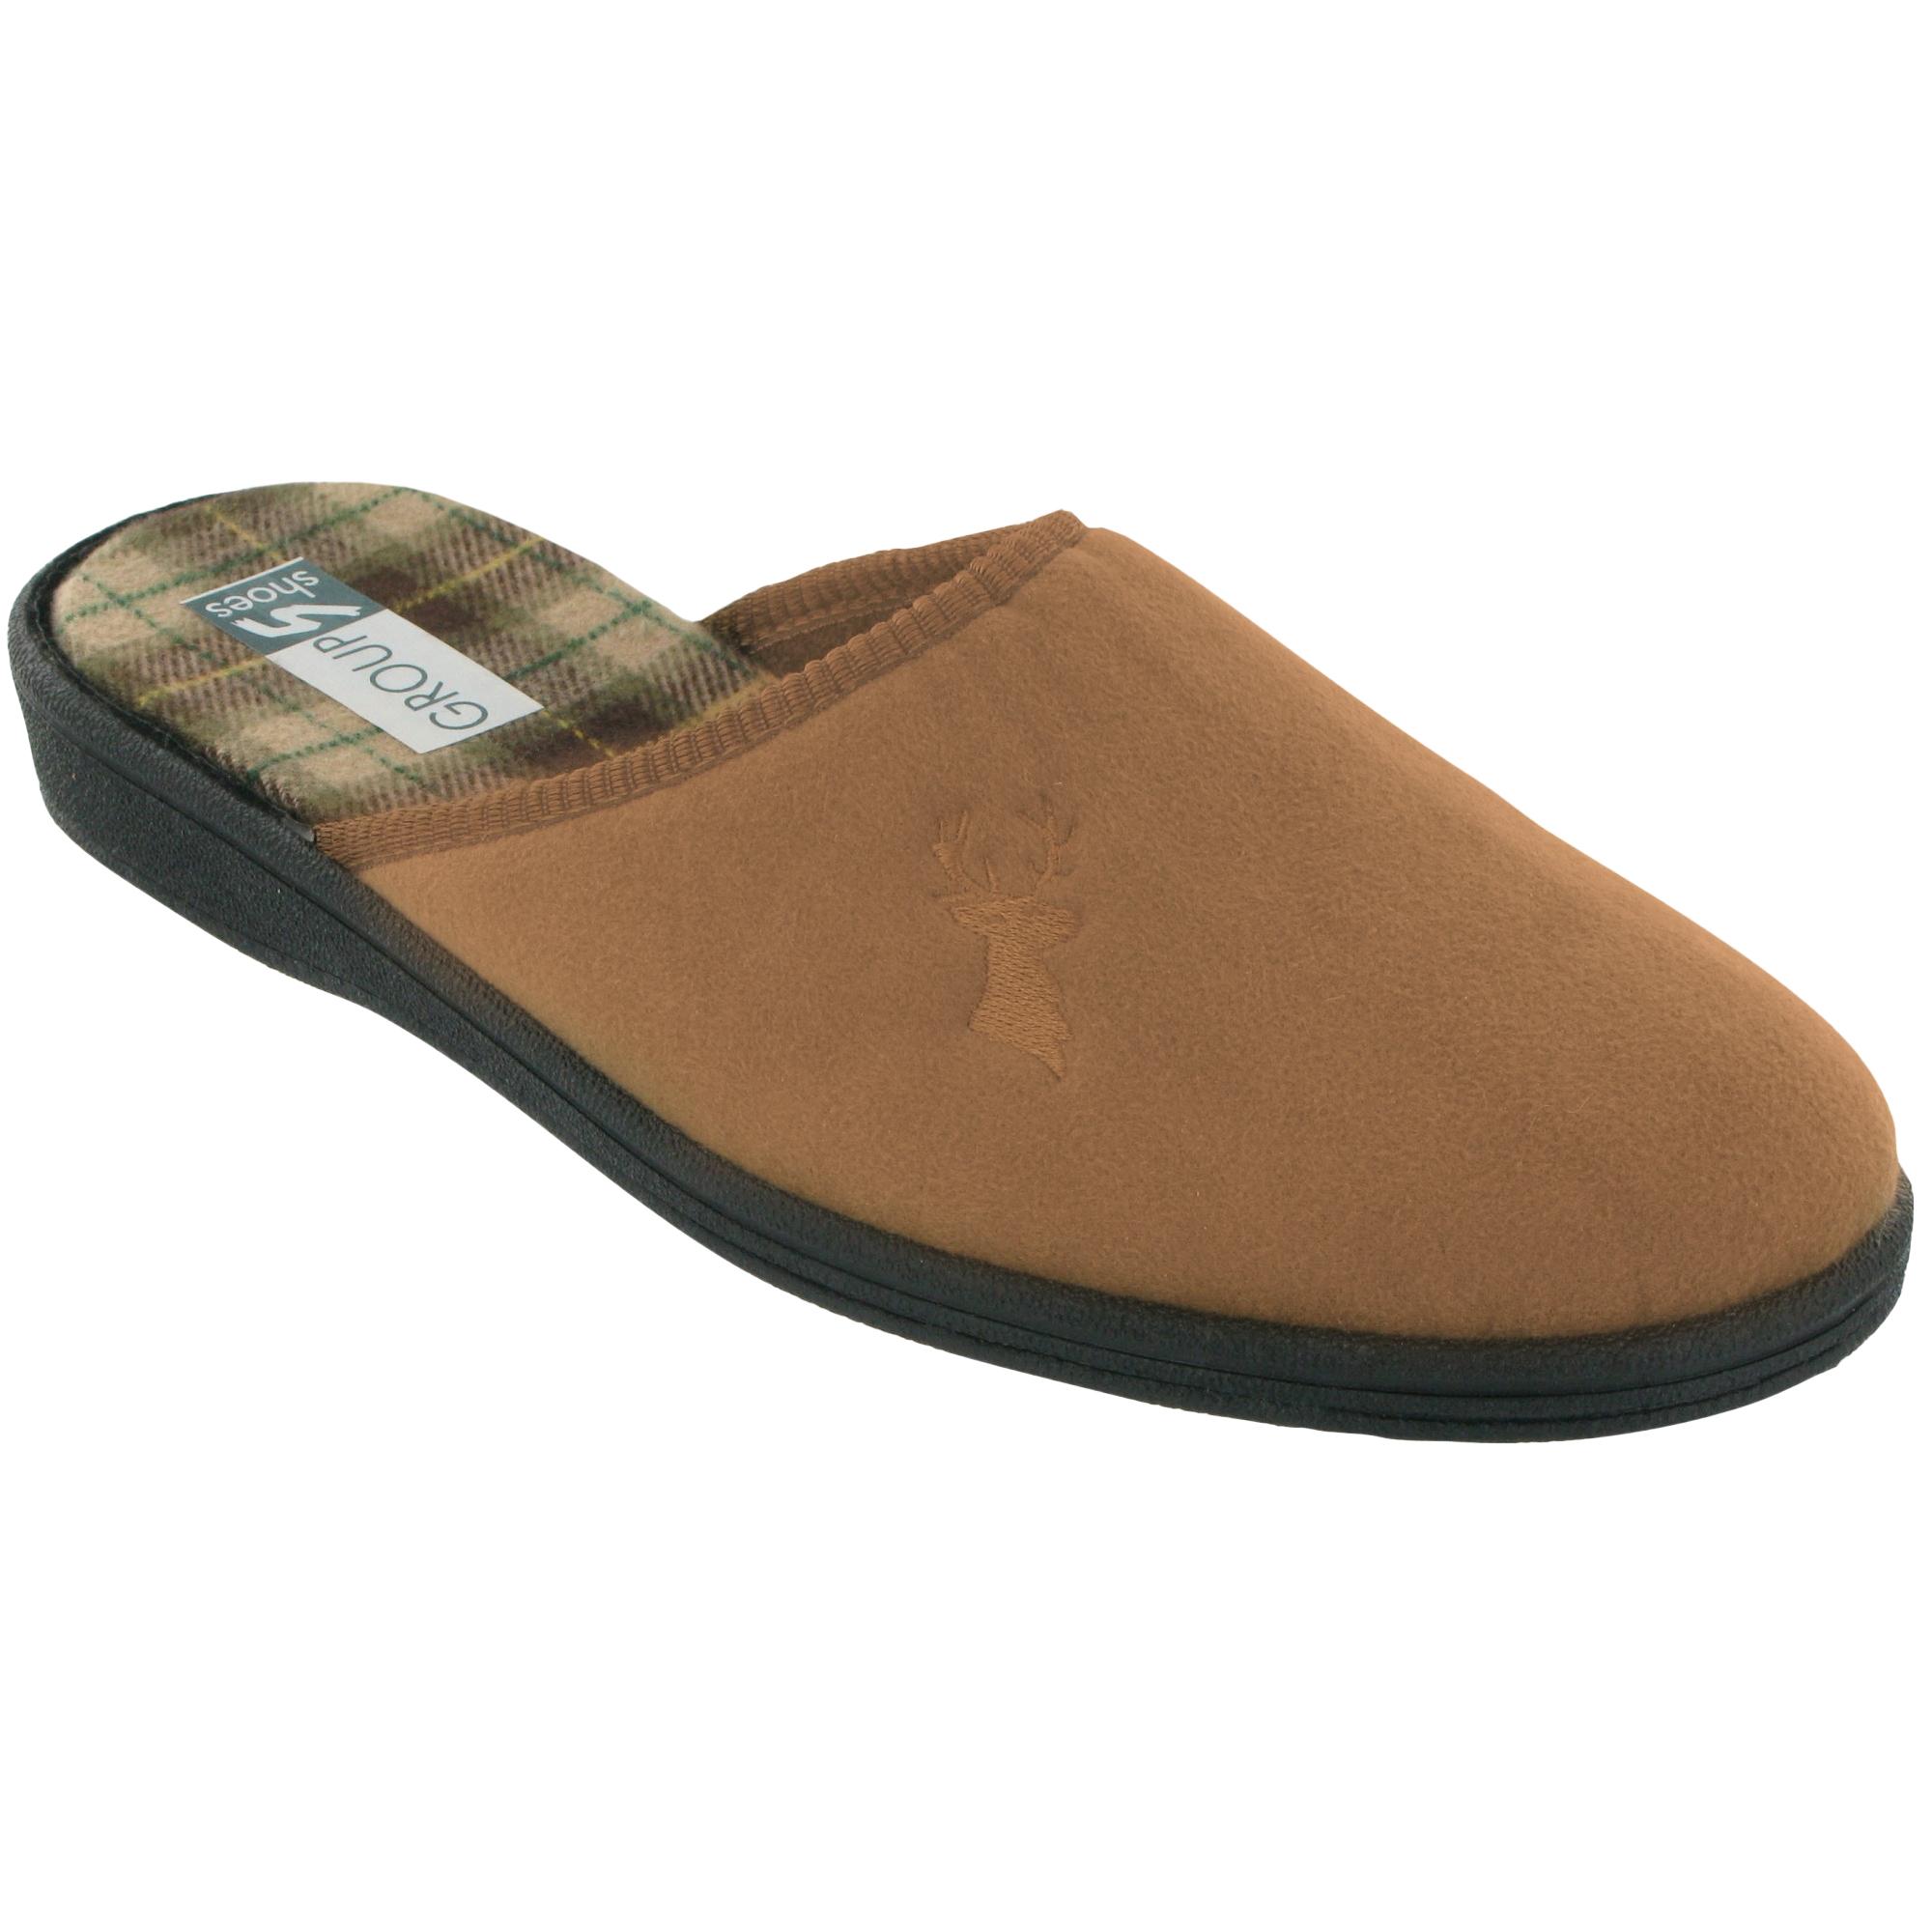 2c82bd85571 Mirak Buck Mens Classic Mule Slip-on Slippers  Scuffs  Indoor Shoes   Footwear